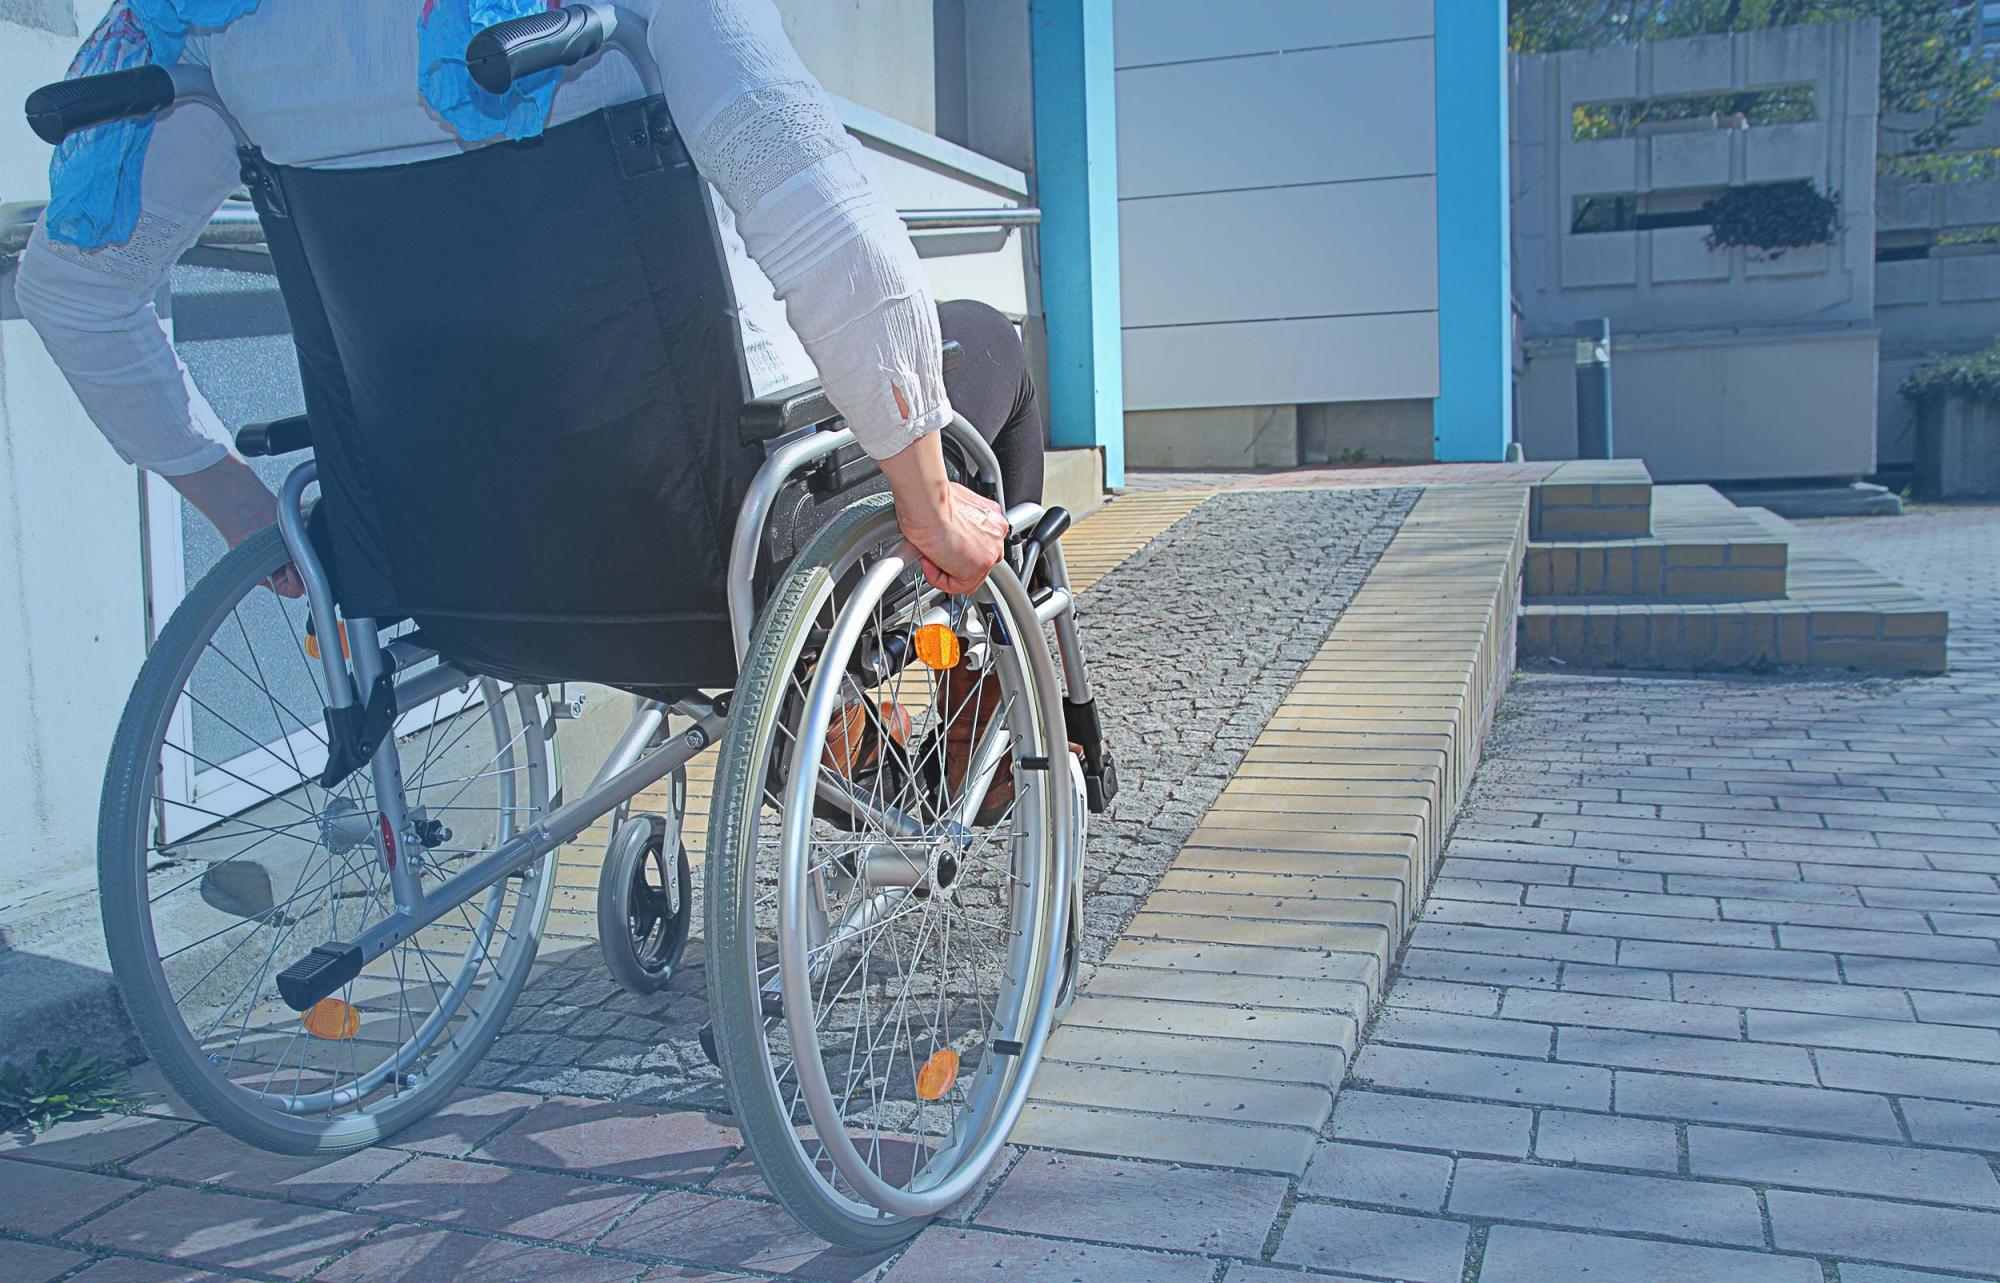 20 лет инвалиды ждут квартиры от государства